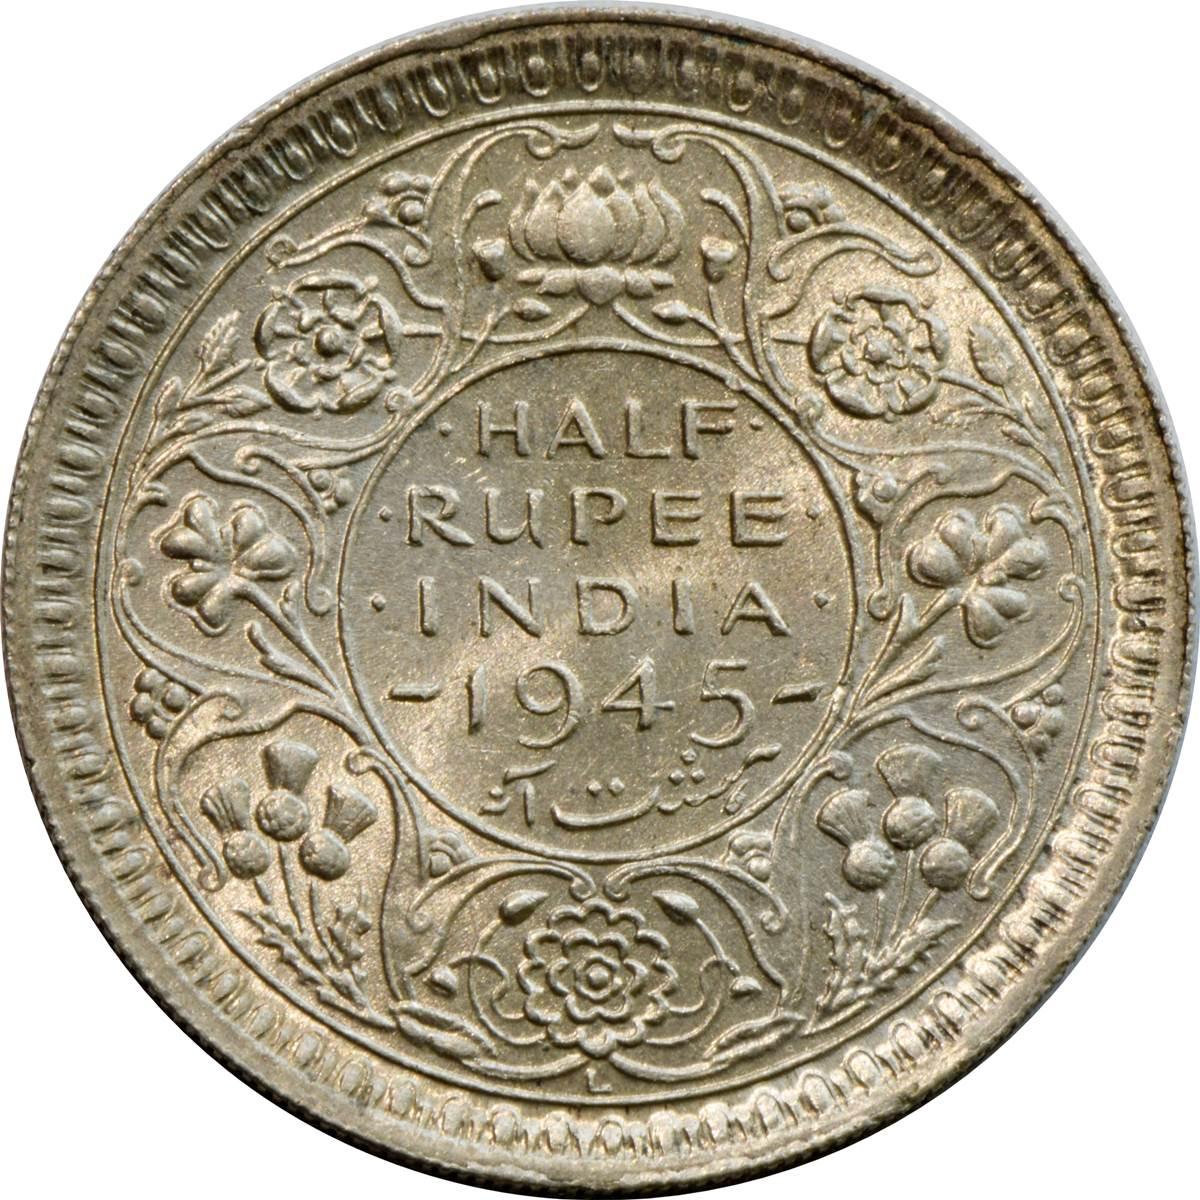 1 Rupee British India George VI Half Silver 1944 @ Excellent Condition